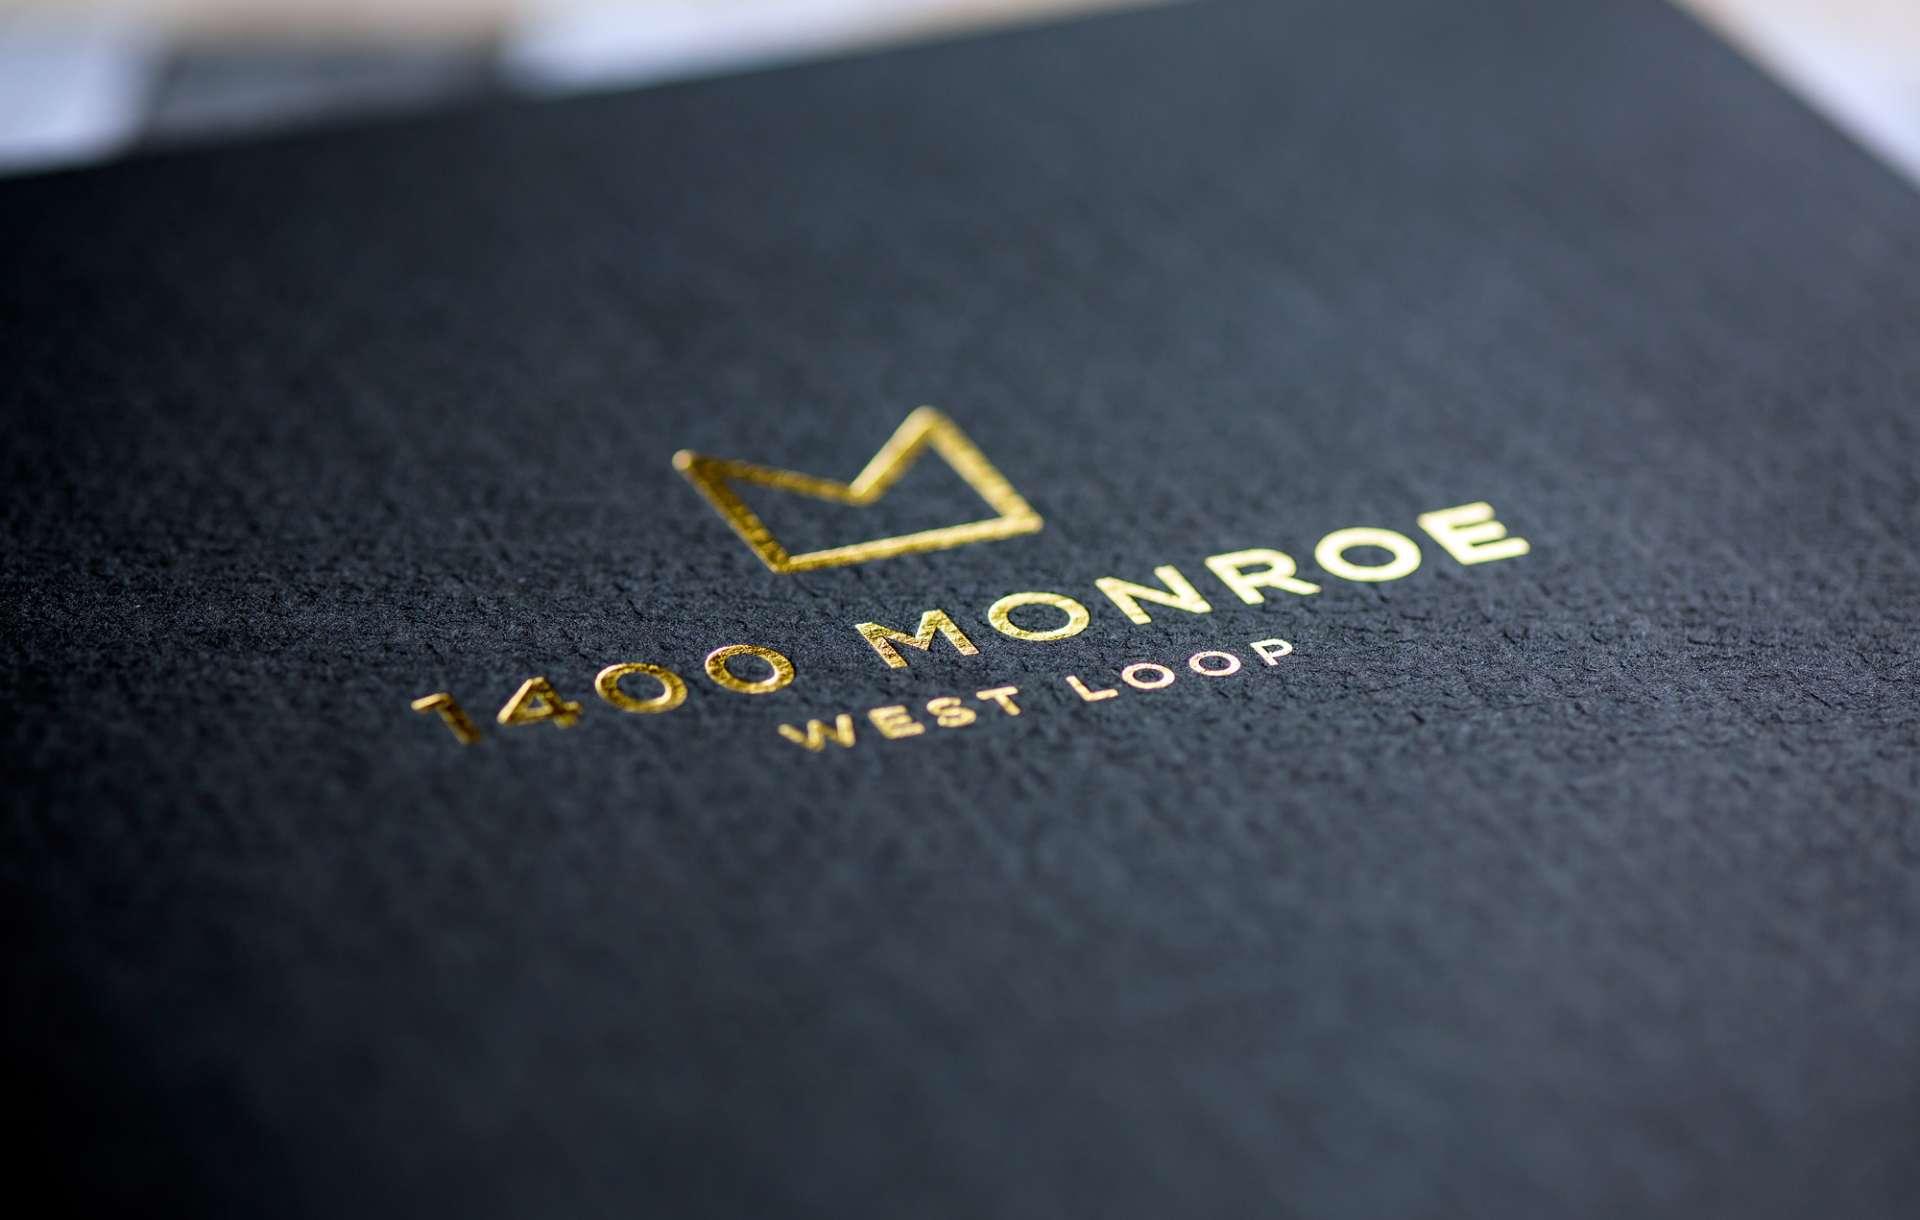 Collateral kit designed for real estate brand 1400 Monroe